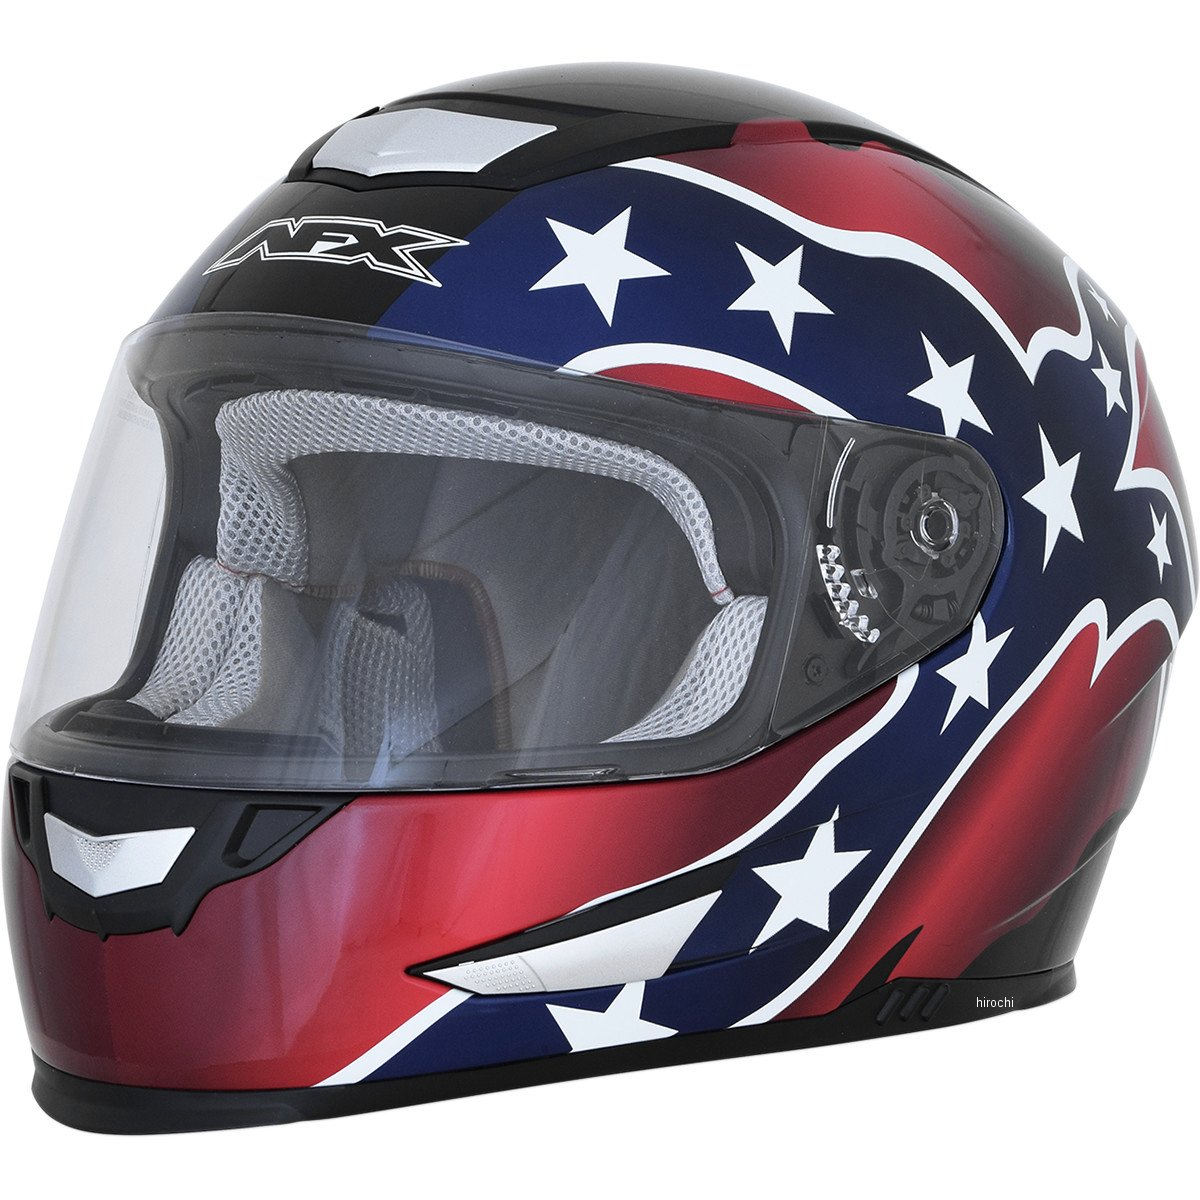 【USA在庫あり】 AFX フルフェイスヘルメット FX-99 黒レベル(つや有り) Lサイズ (59cm-60cm) 0101-11373 JP店